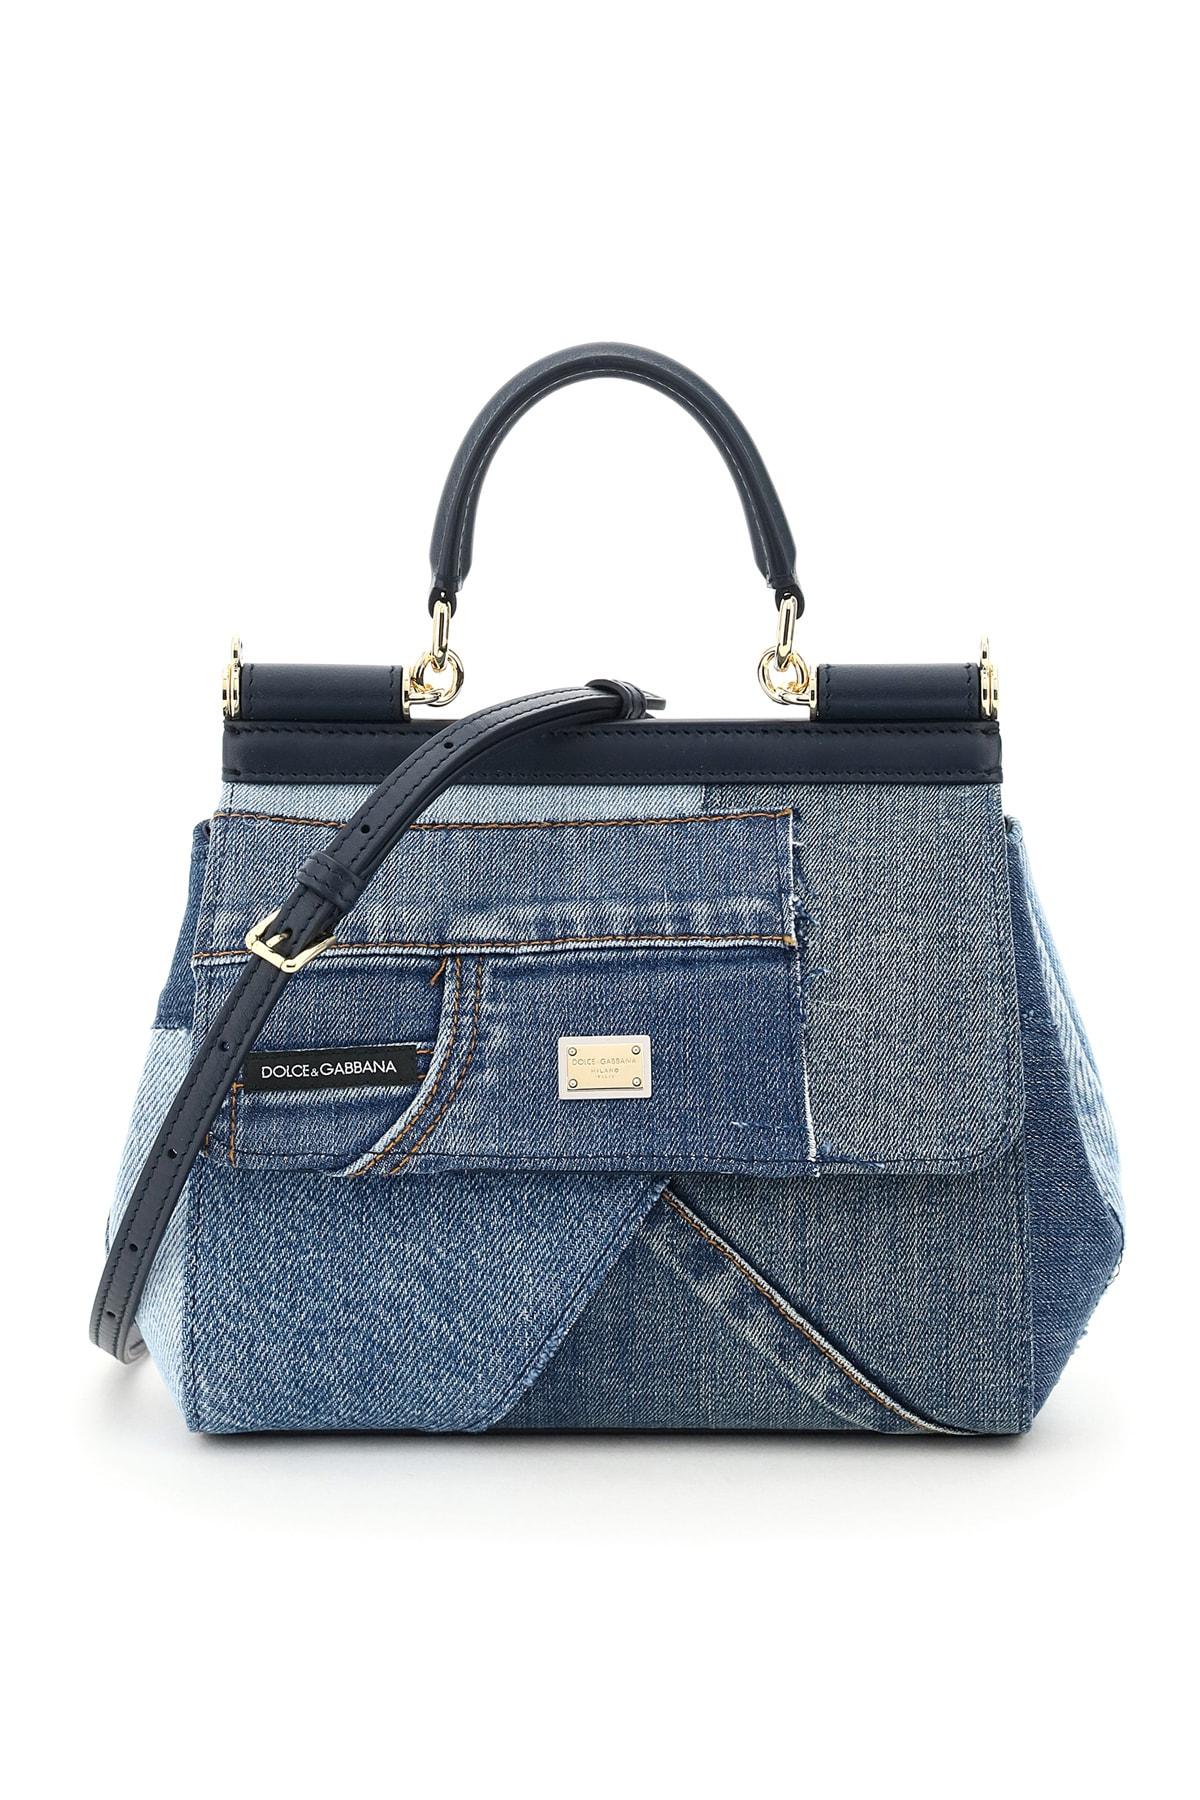 Dolce & Gabbana PATCHWORK DENIM SICILY SMALL BAG